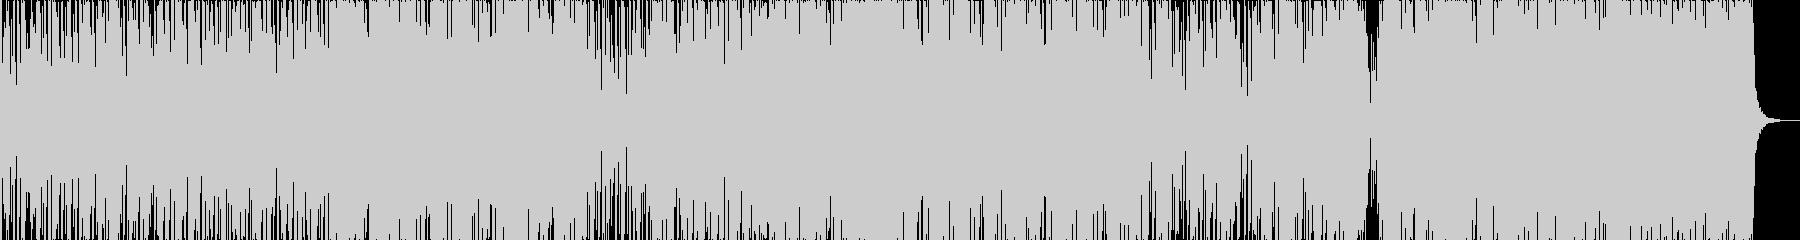 kawaiiダンスミュージックの未再生の波形